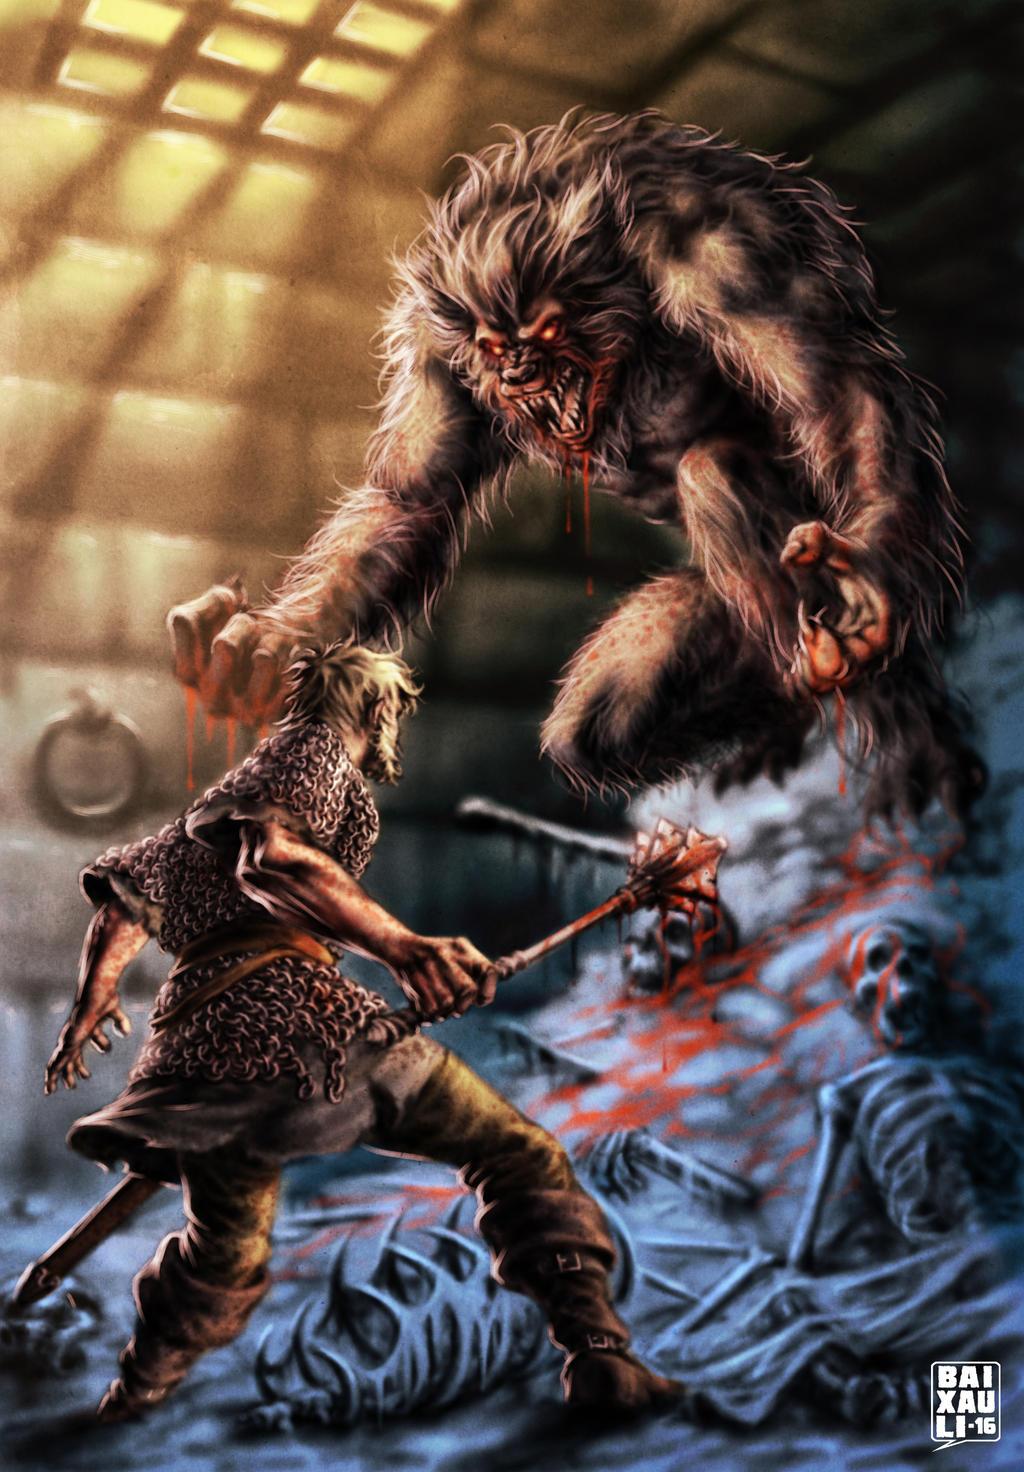 Burkran: The Lycanthrope by BAI-XAU-LI